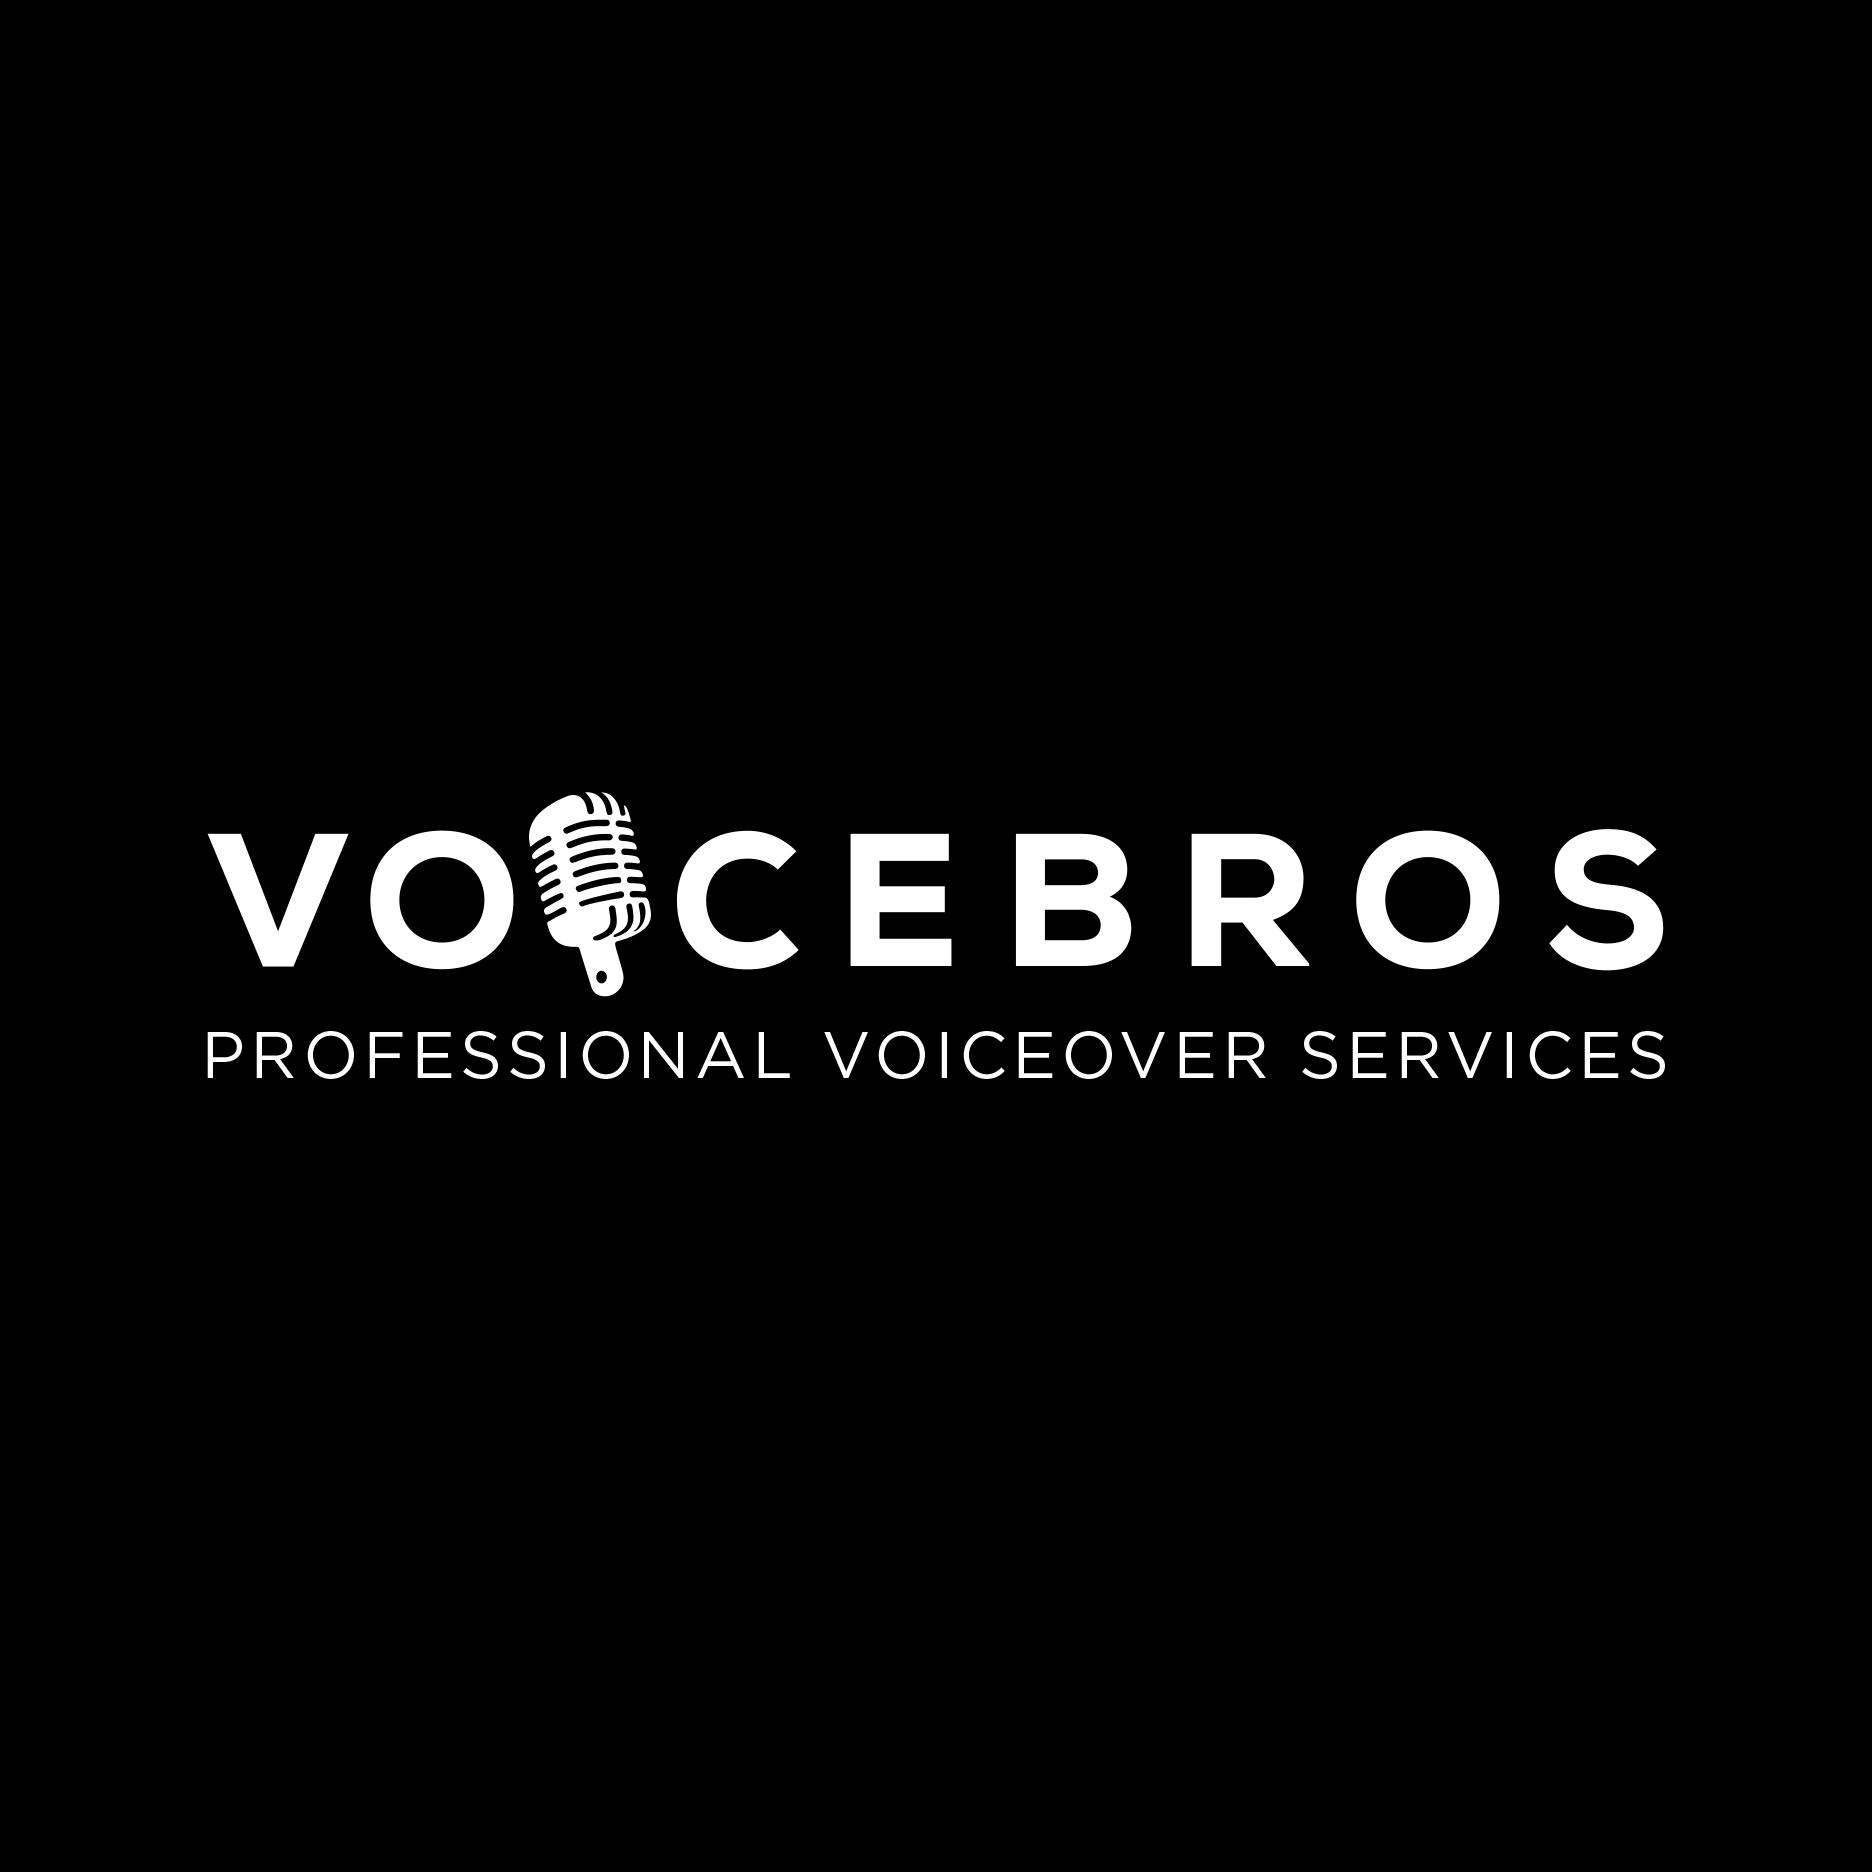 Al Ghanekar is a voice over actor